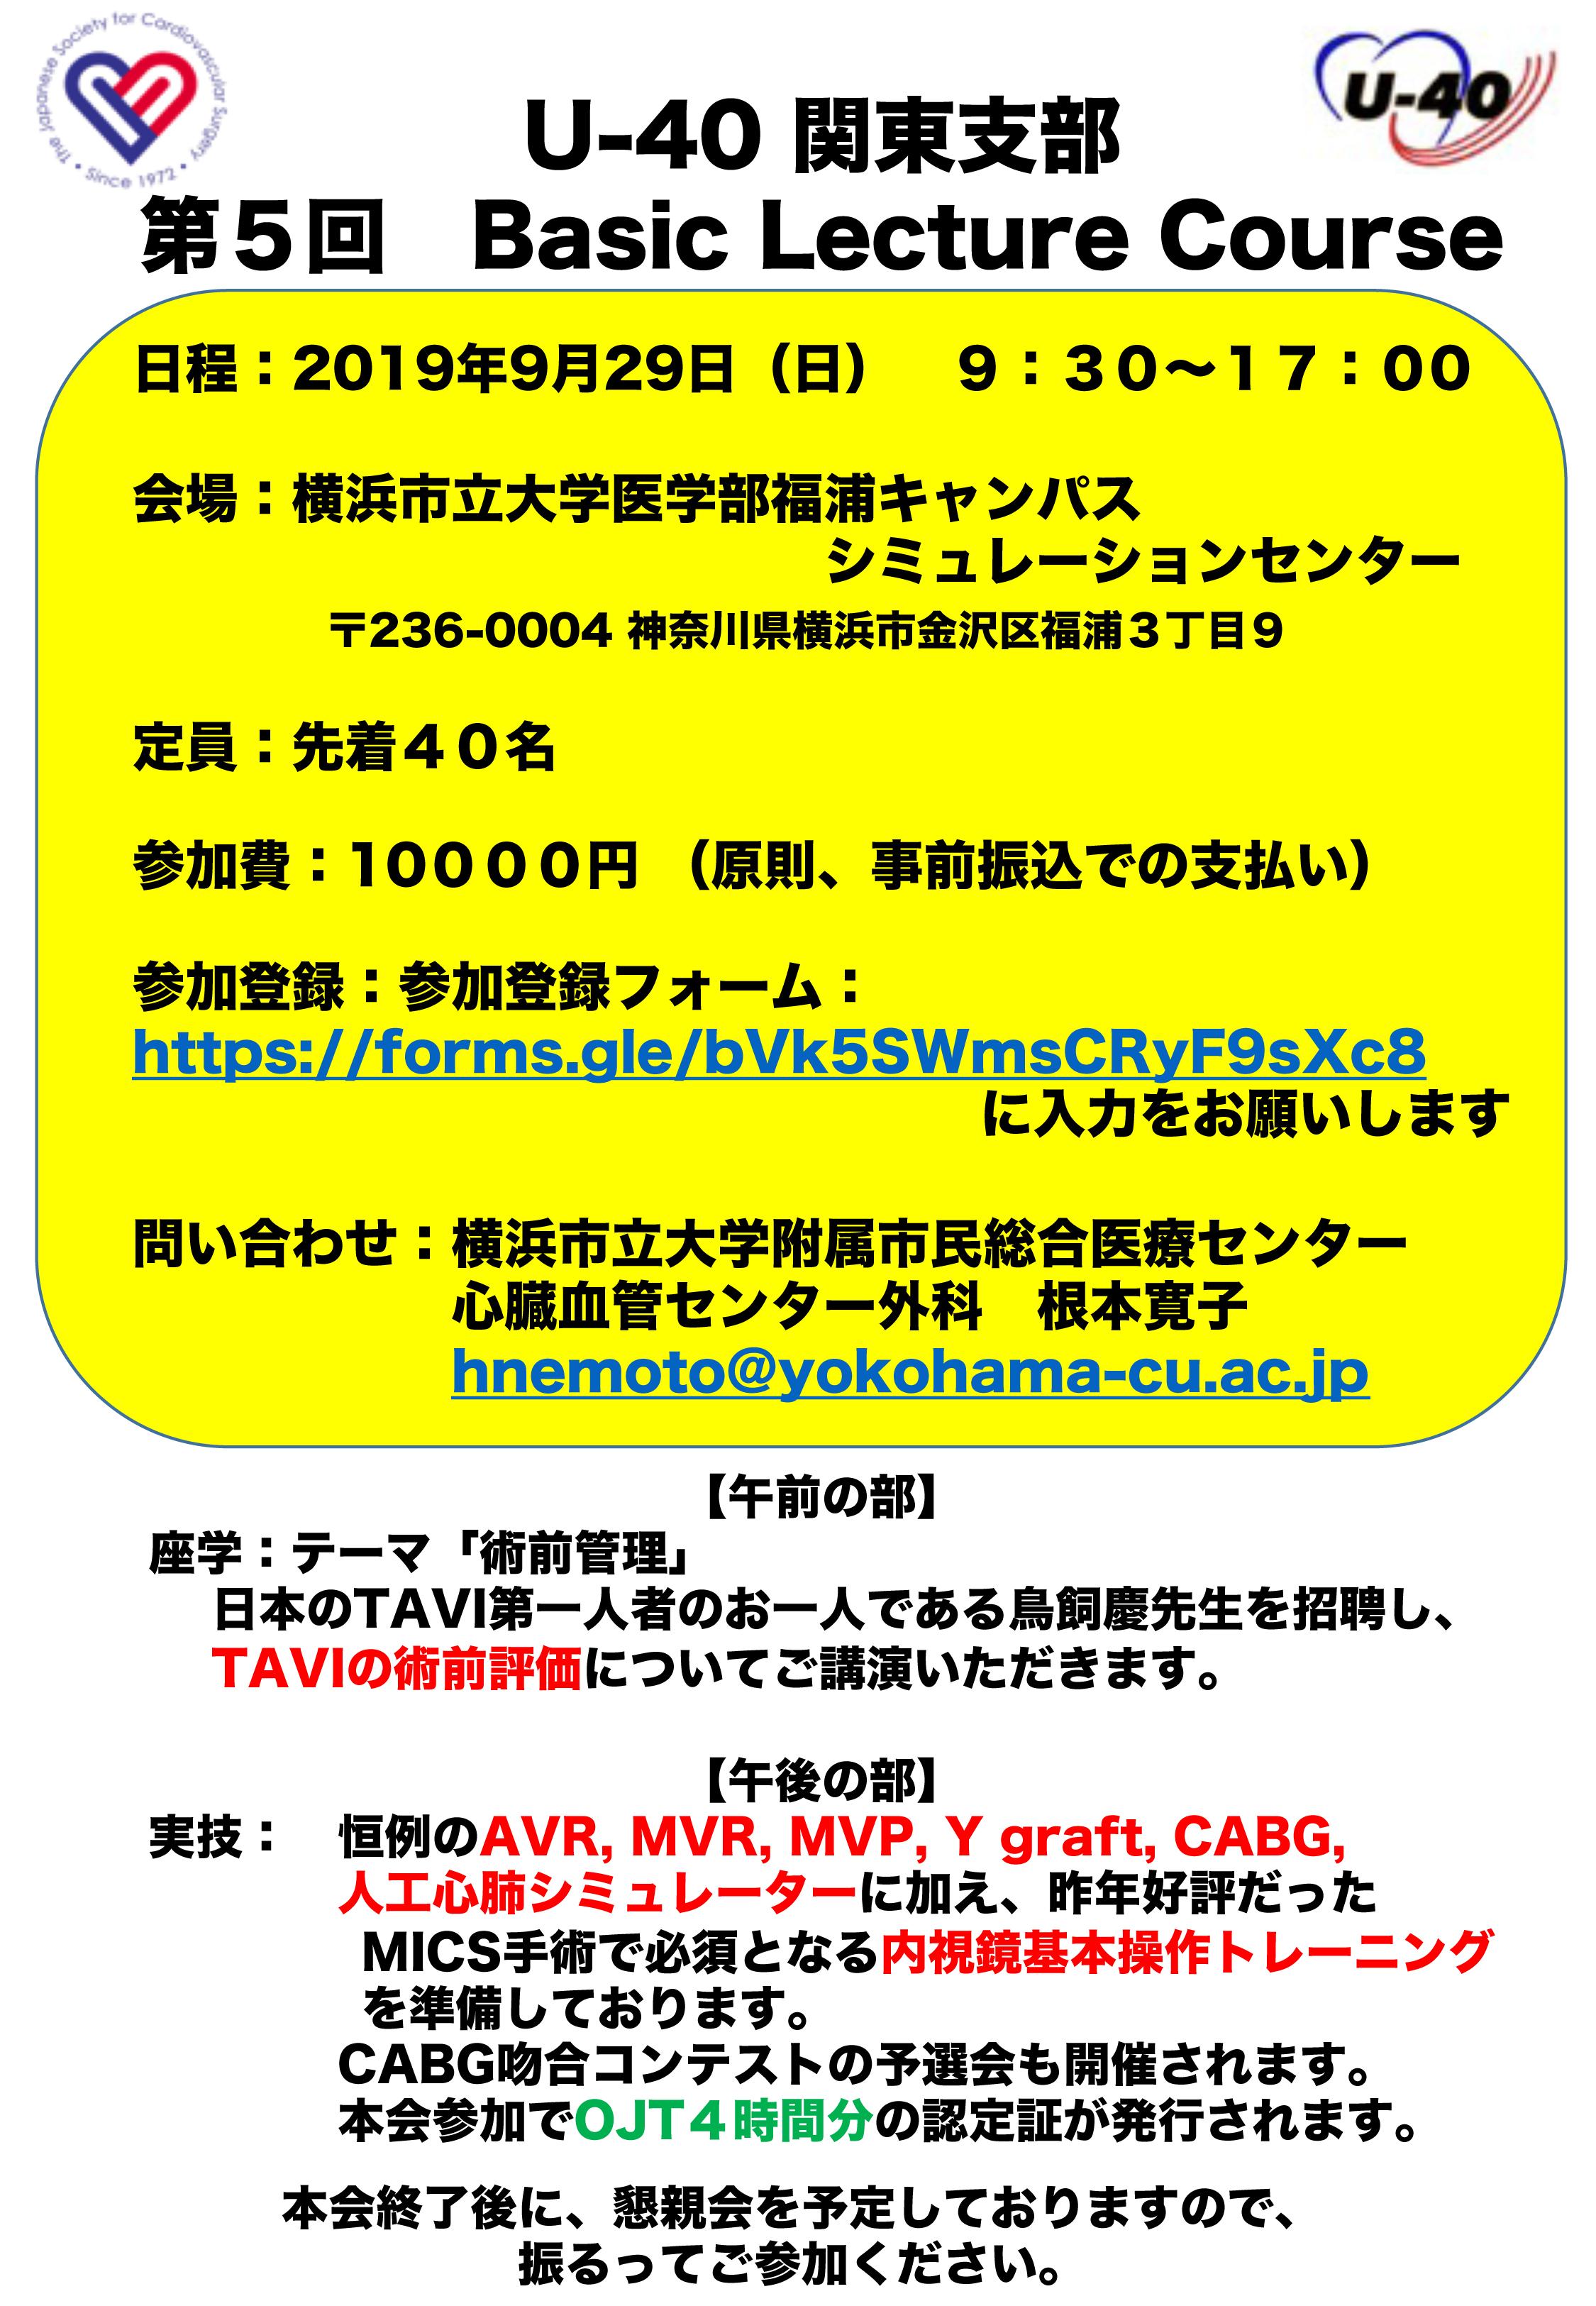 6月17日 第5回 U-40関東支部Basic Lecture Course